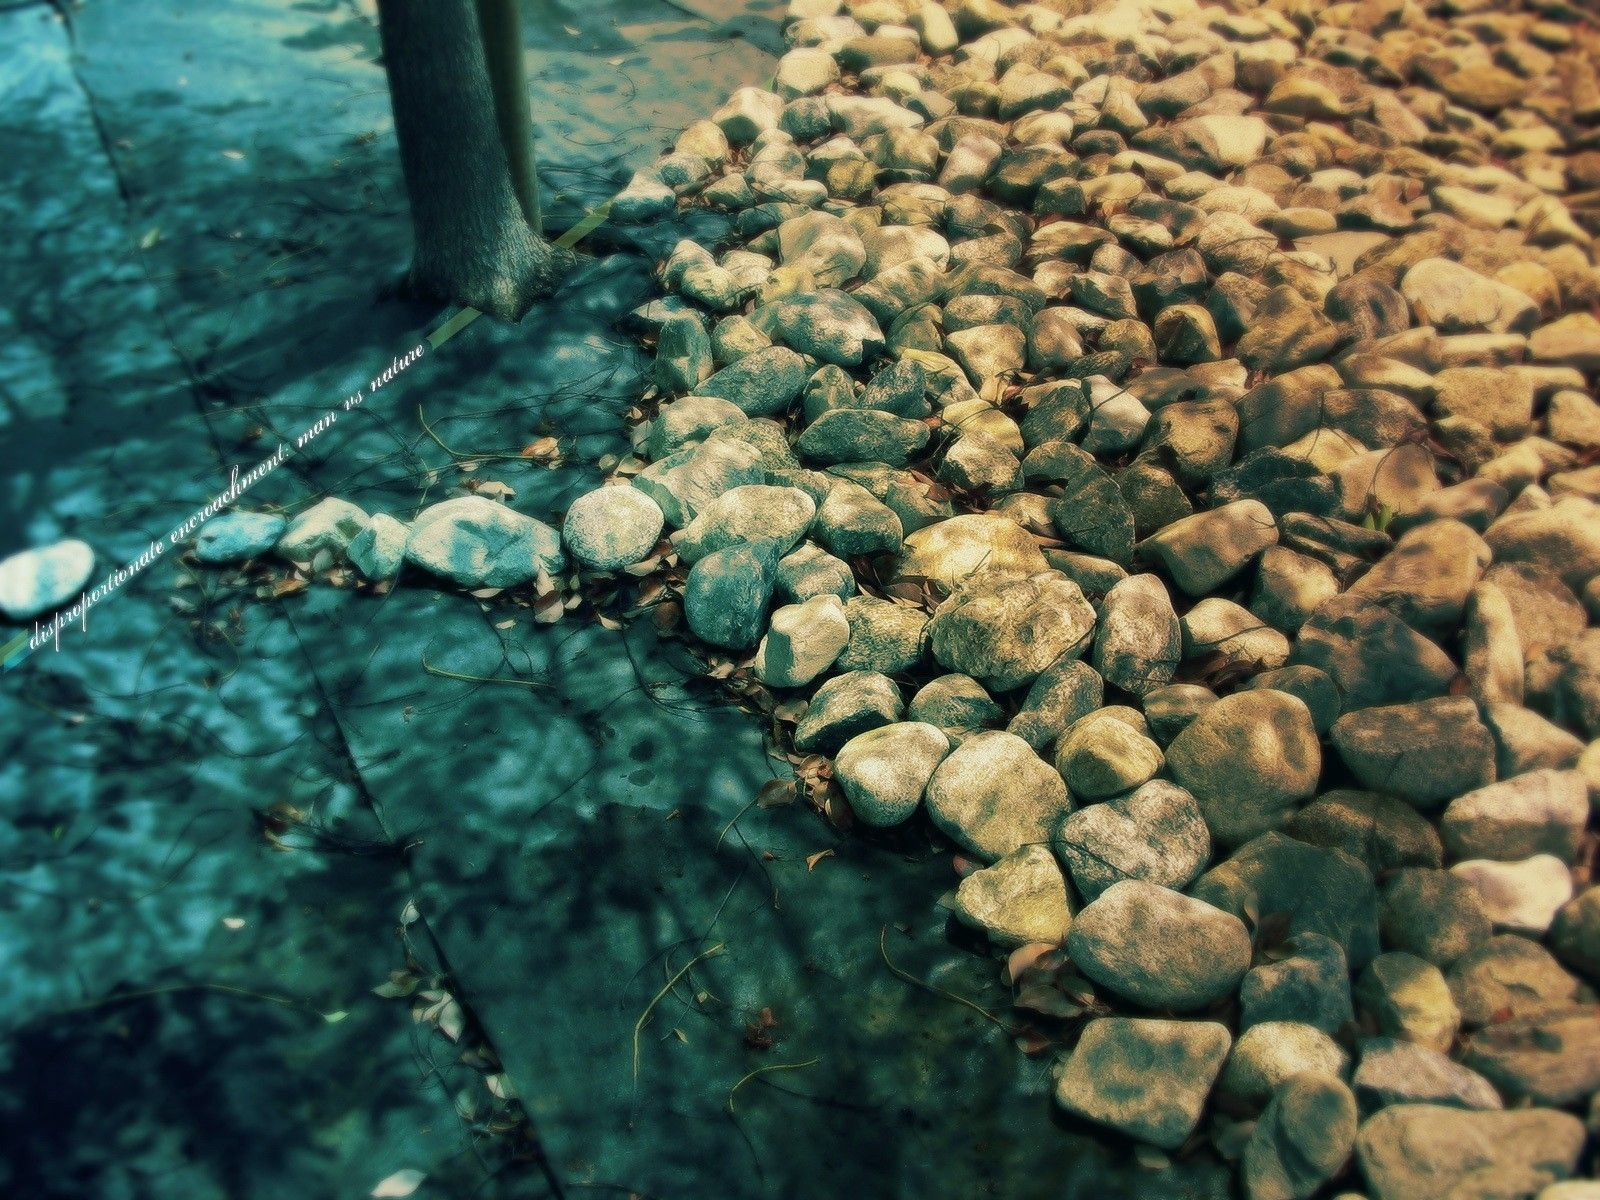 Pebbles on the brook